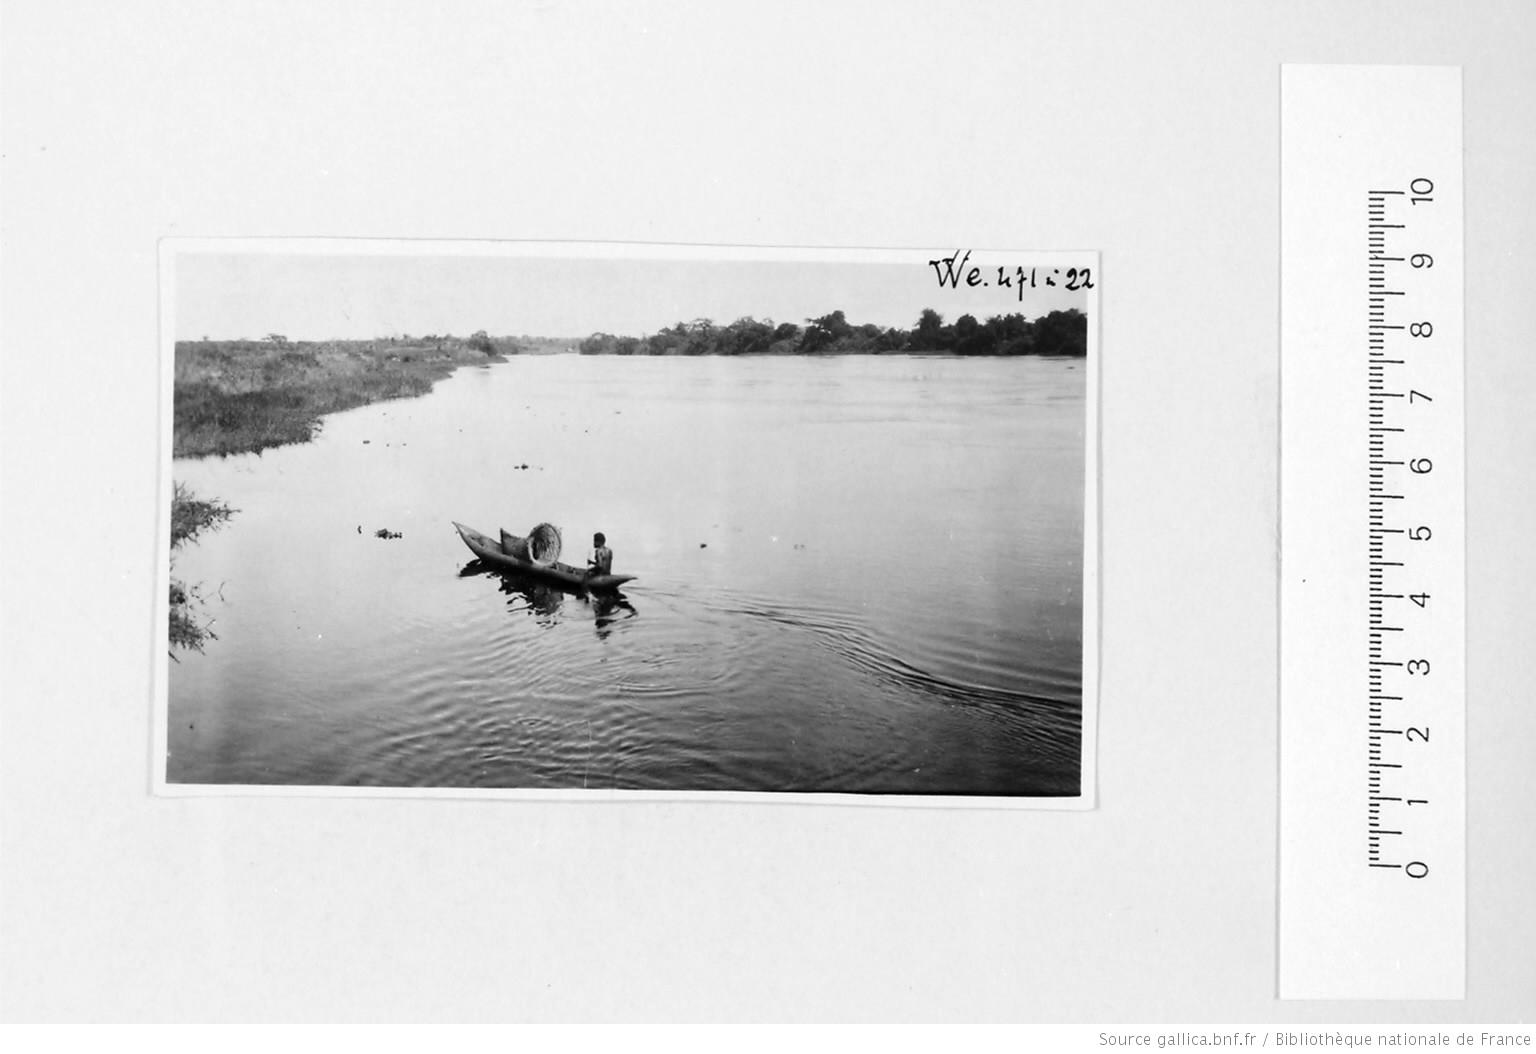 [39 phot. d'A.E.F. en 1924. Enregistré en 1936] - 22